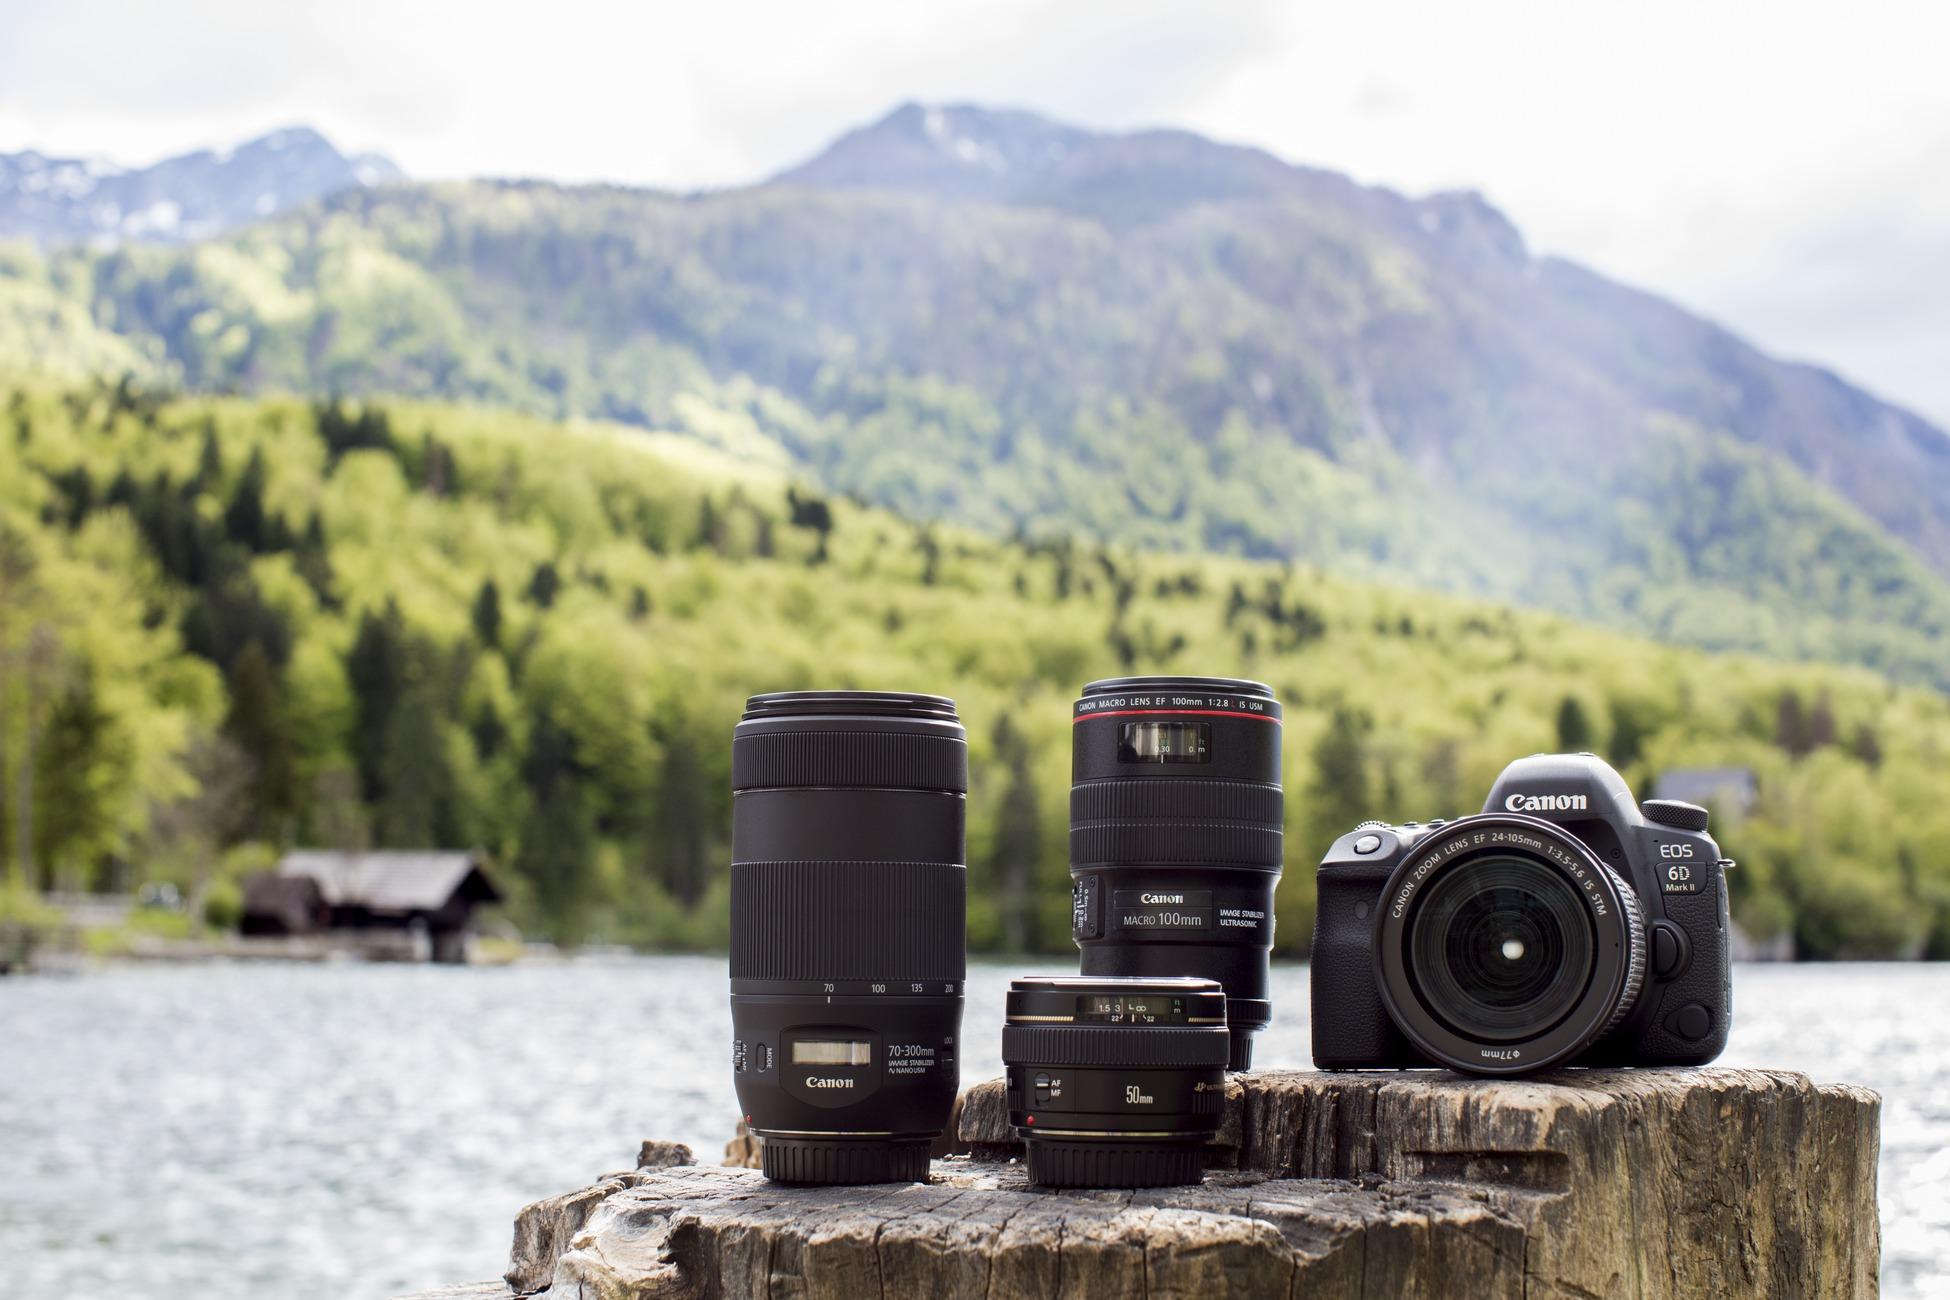 Canon EOS 6D Mark II vs Canon EOS 6D - Is it worth upgrading